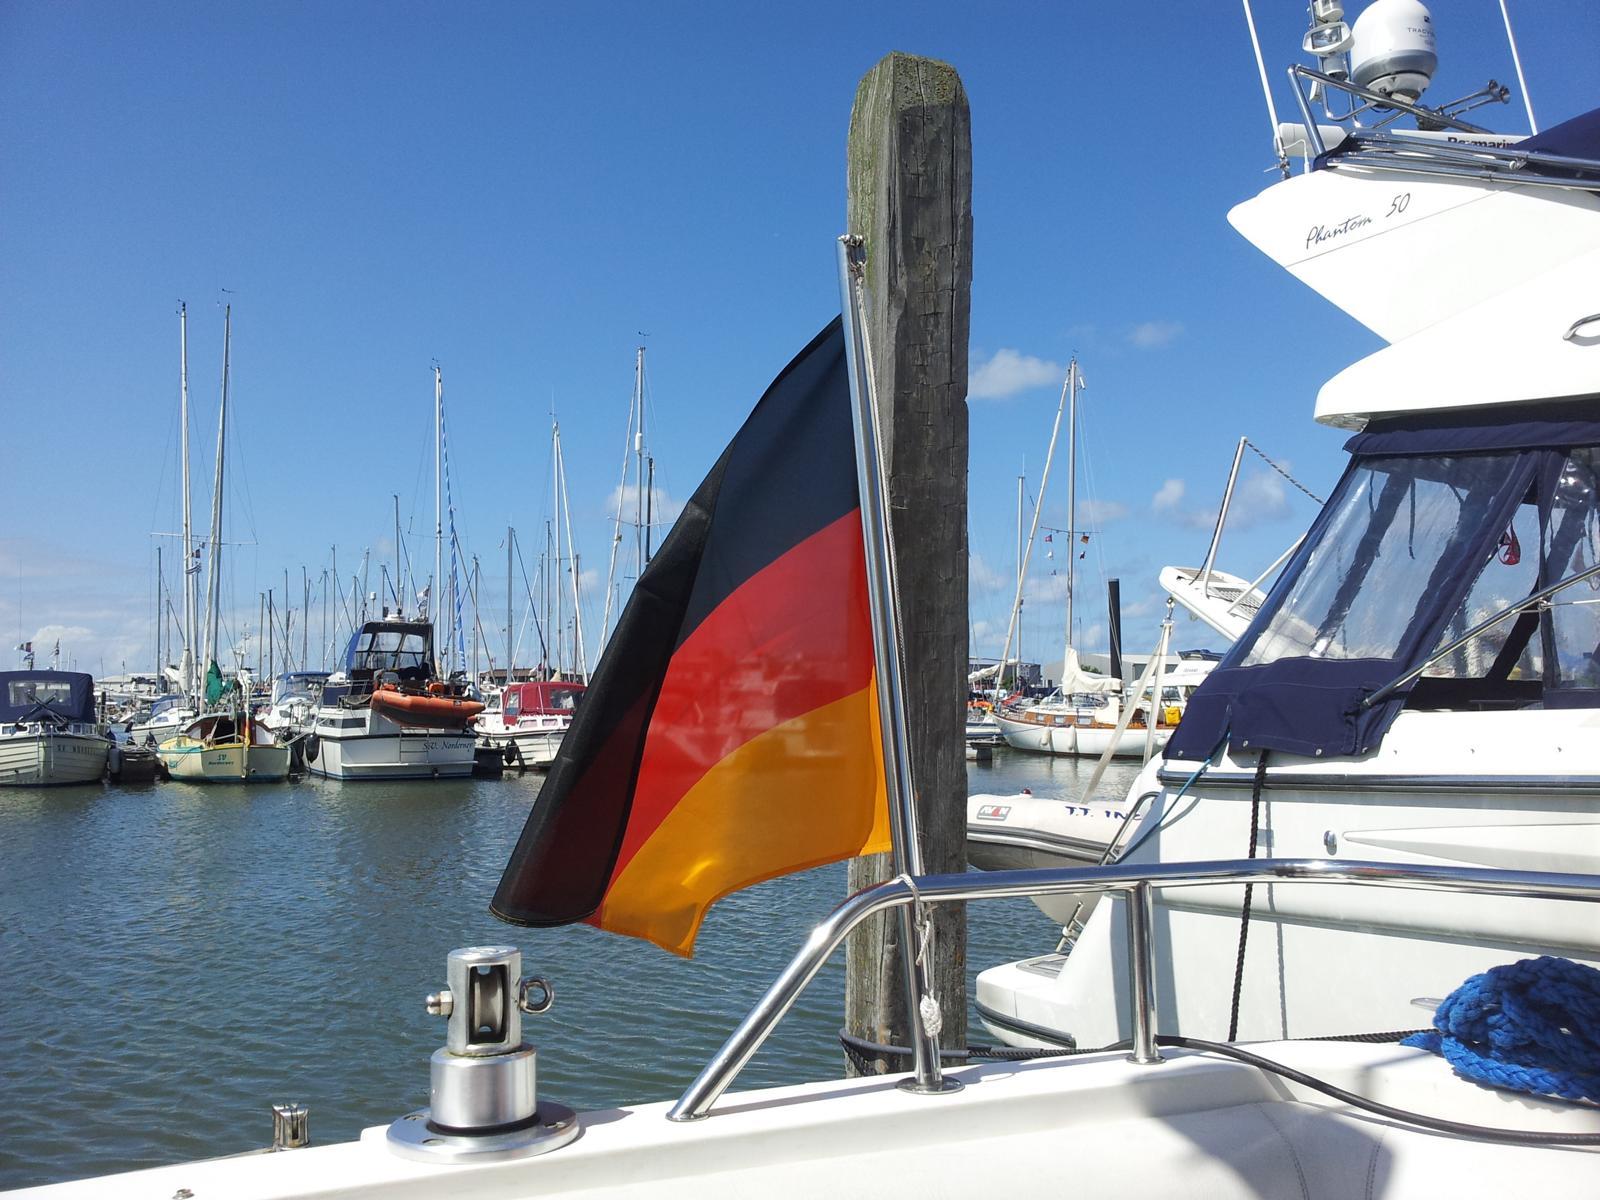 Inselflair - Monasteria Yachtclub Münster